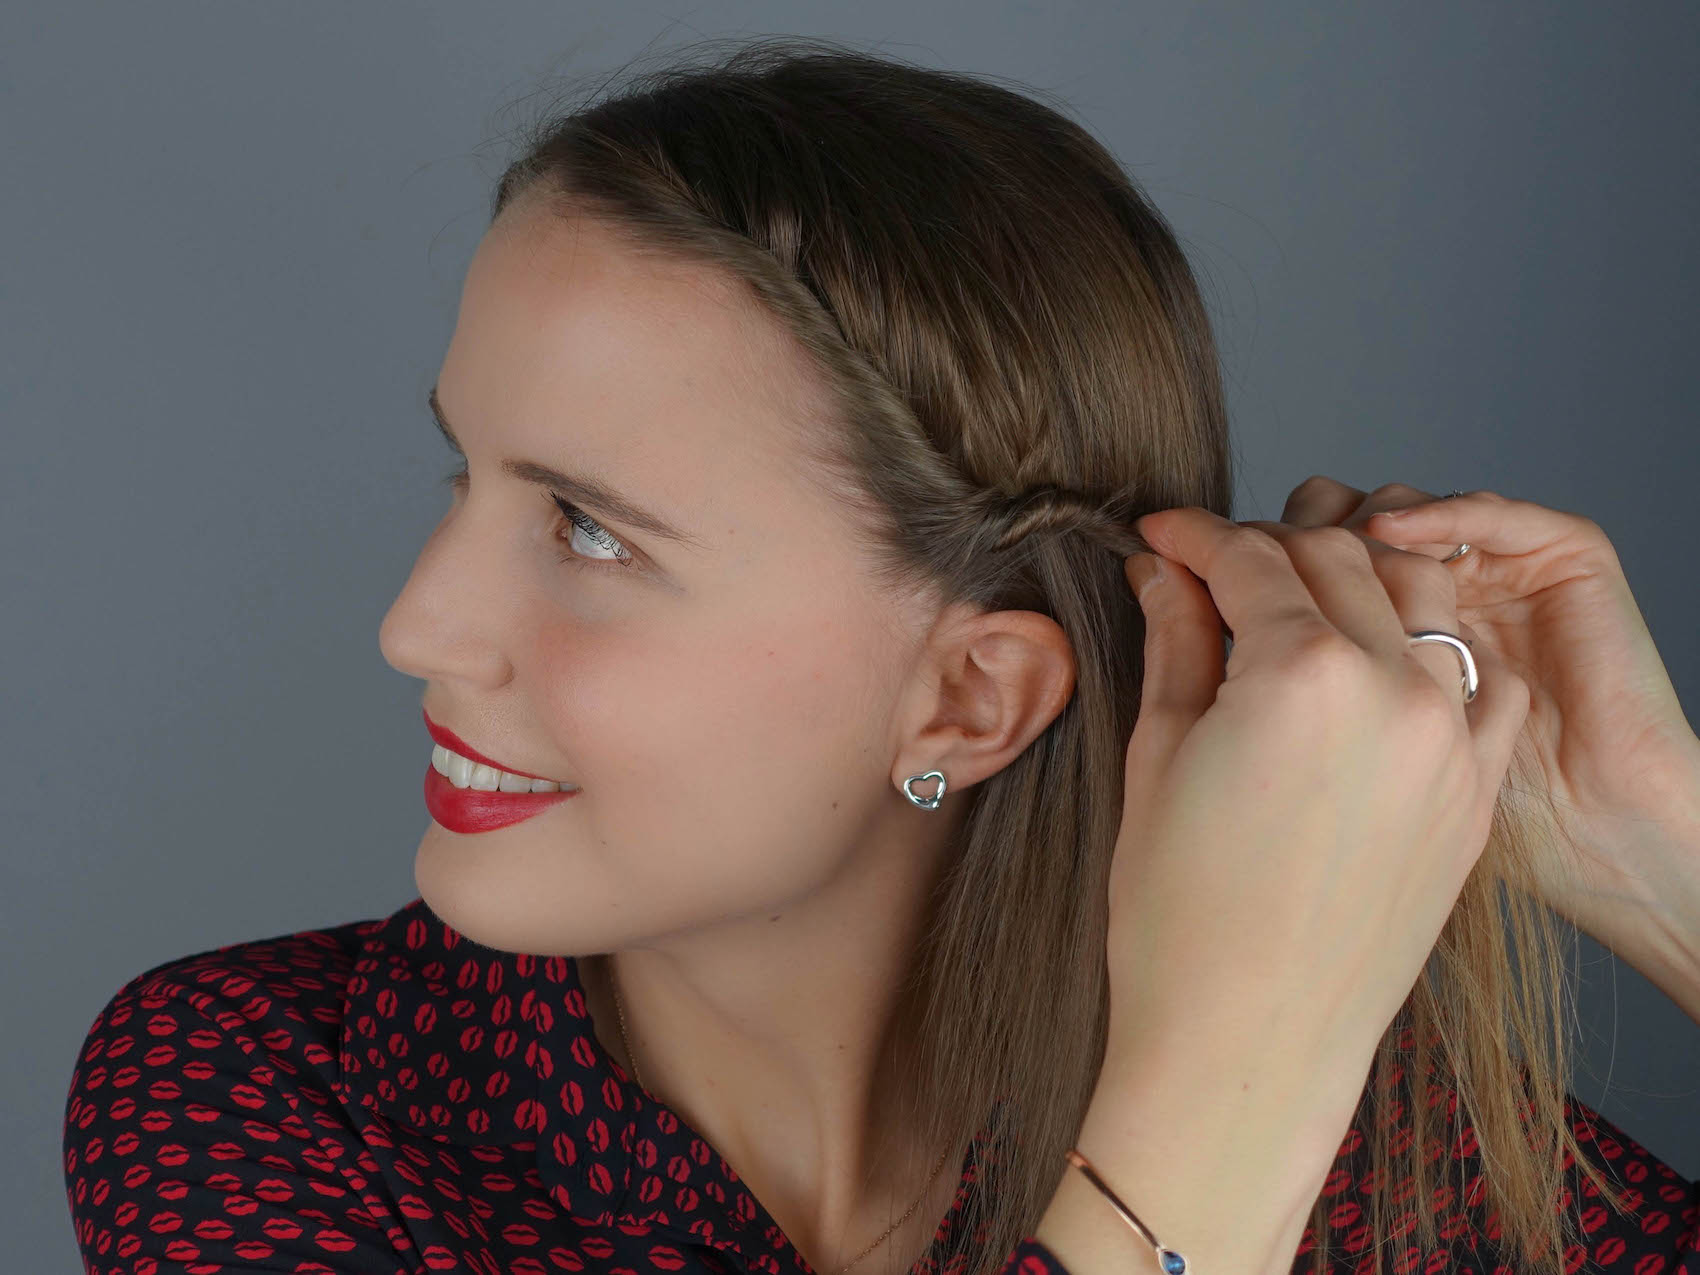 3_1_Suelovesnyc_Silvester_frisuren_styles_newyears_hairstyles_hairstyling_taft_schwarzkopf_susan_fengler_aufmacher_flechtfrisur_winter